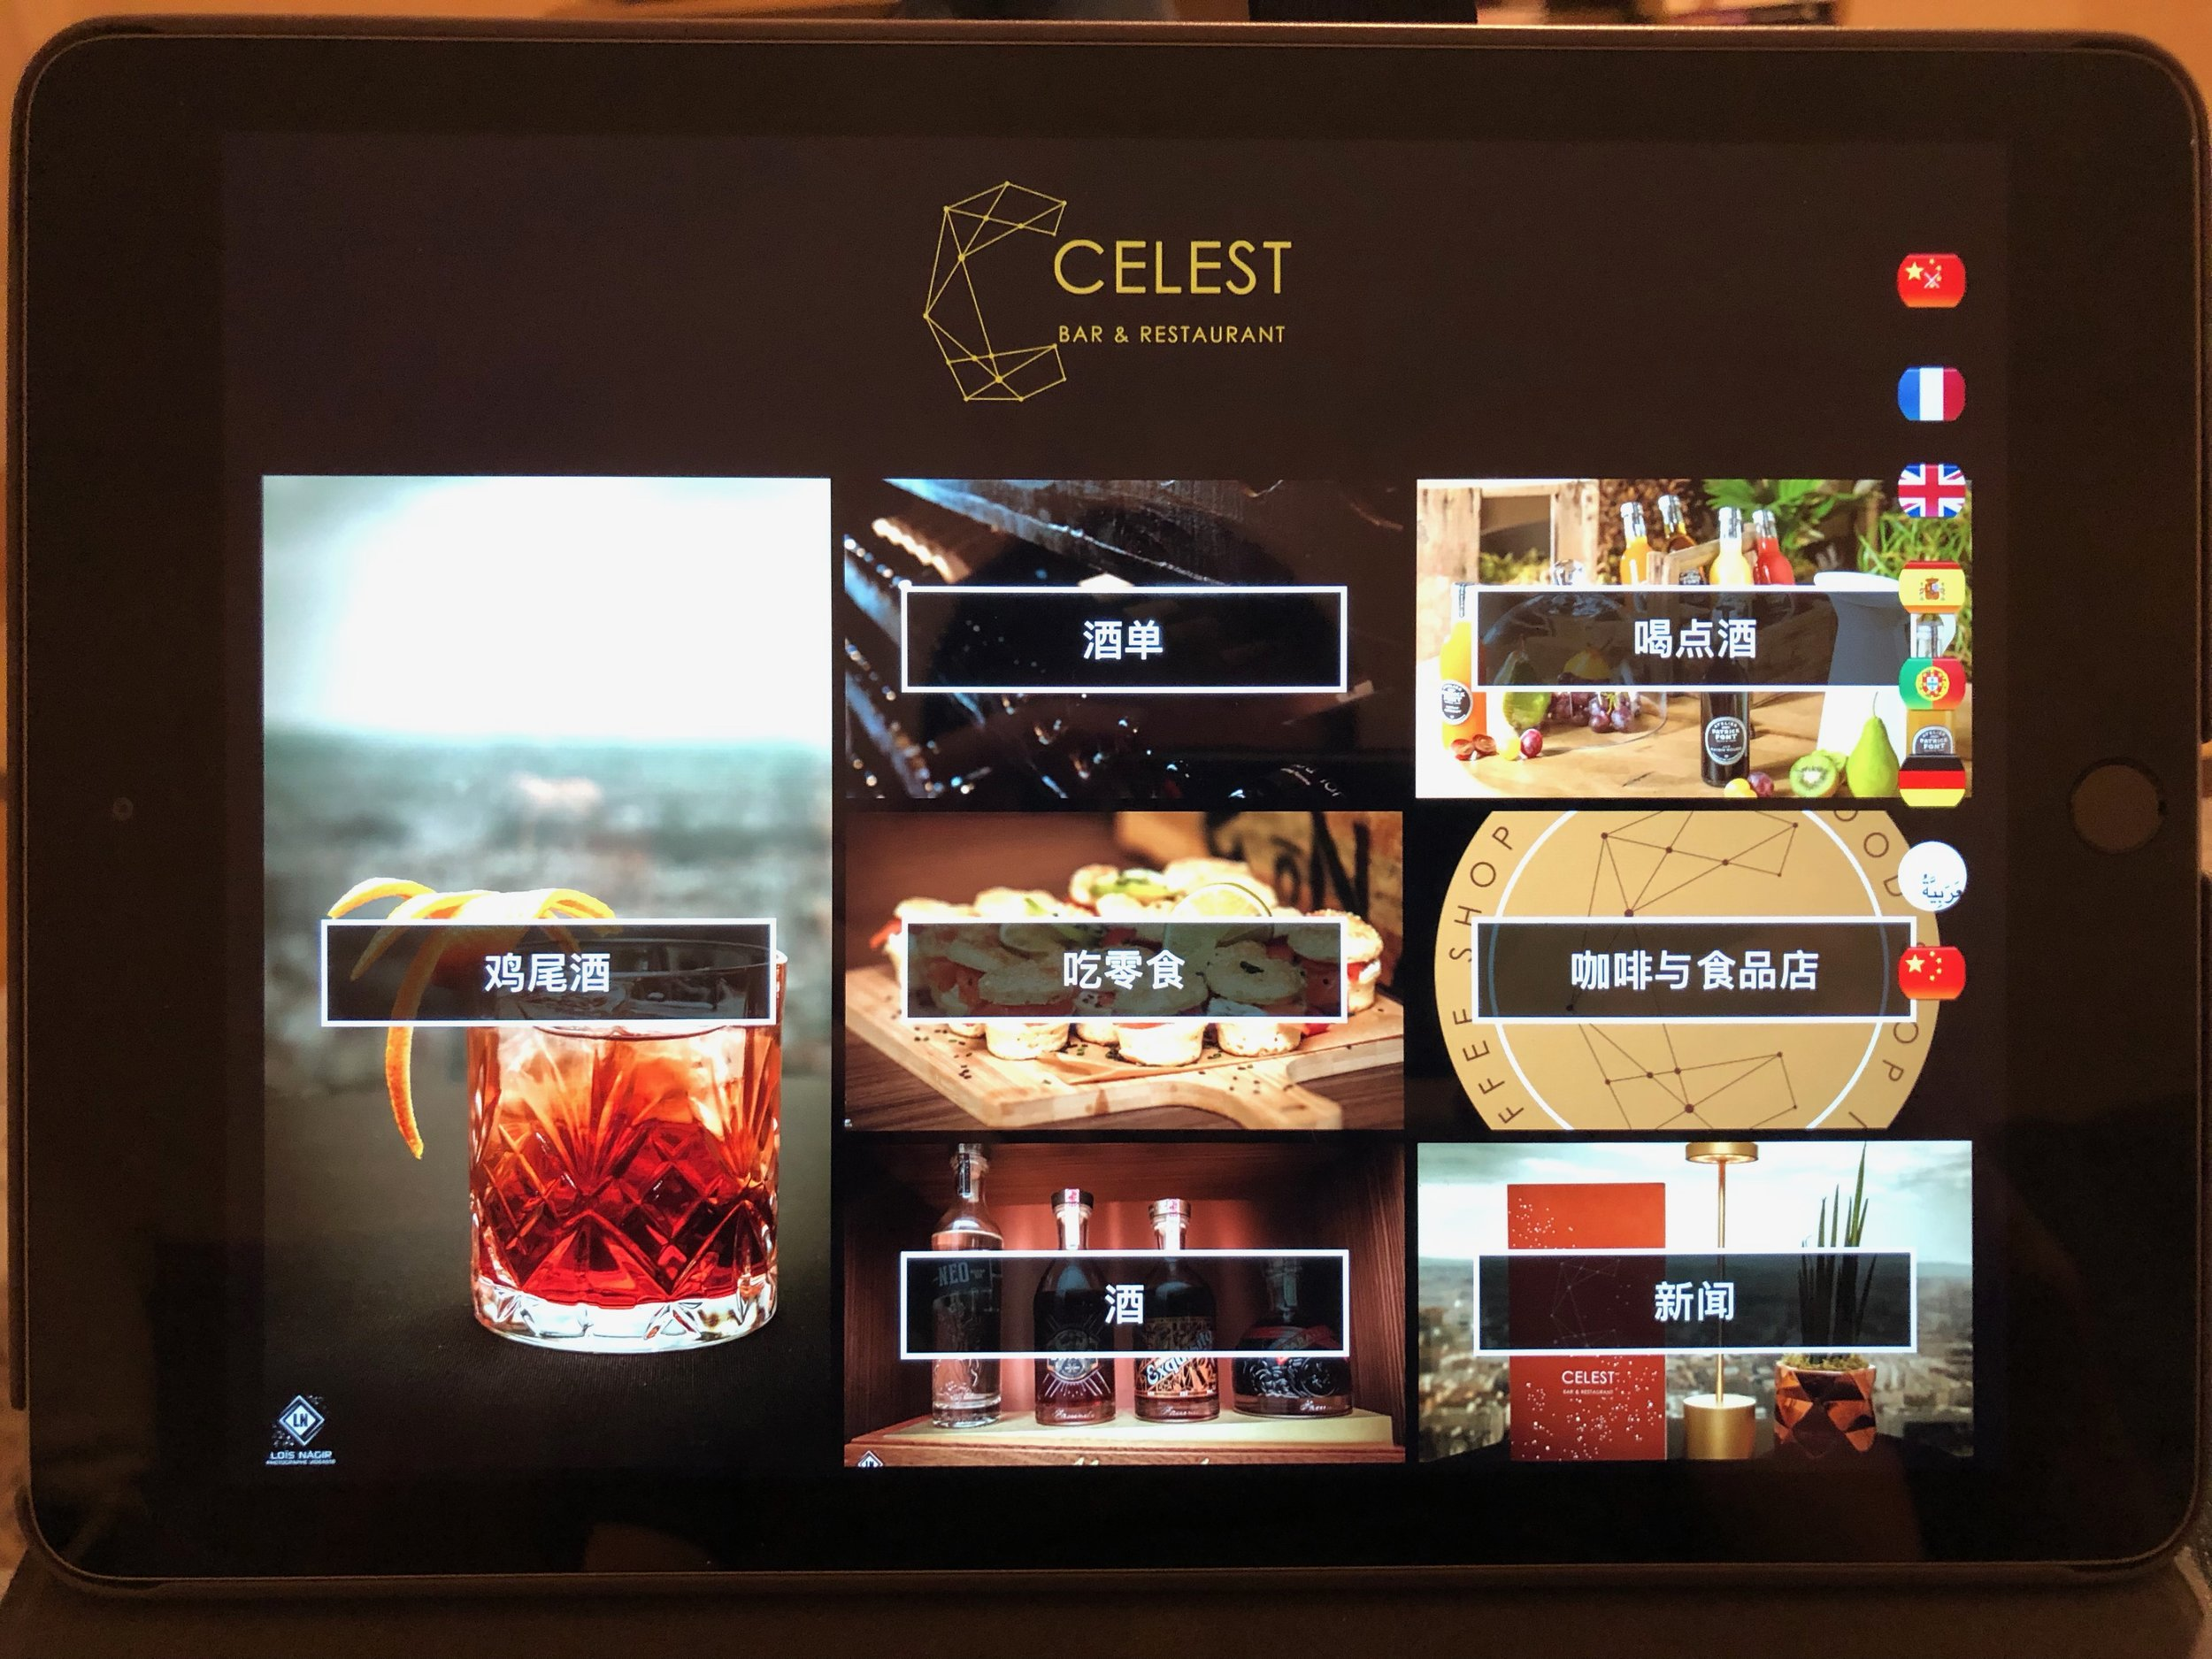 Menu restaurant en chinois tablette tactile.jpg